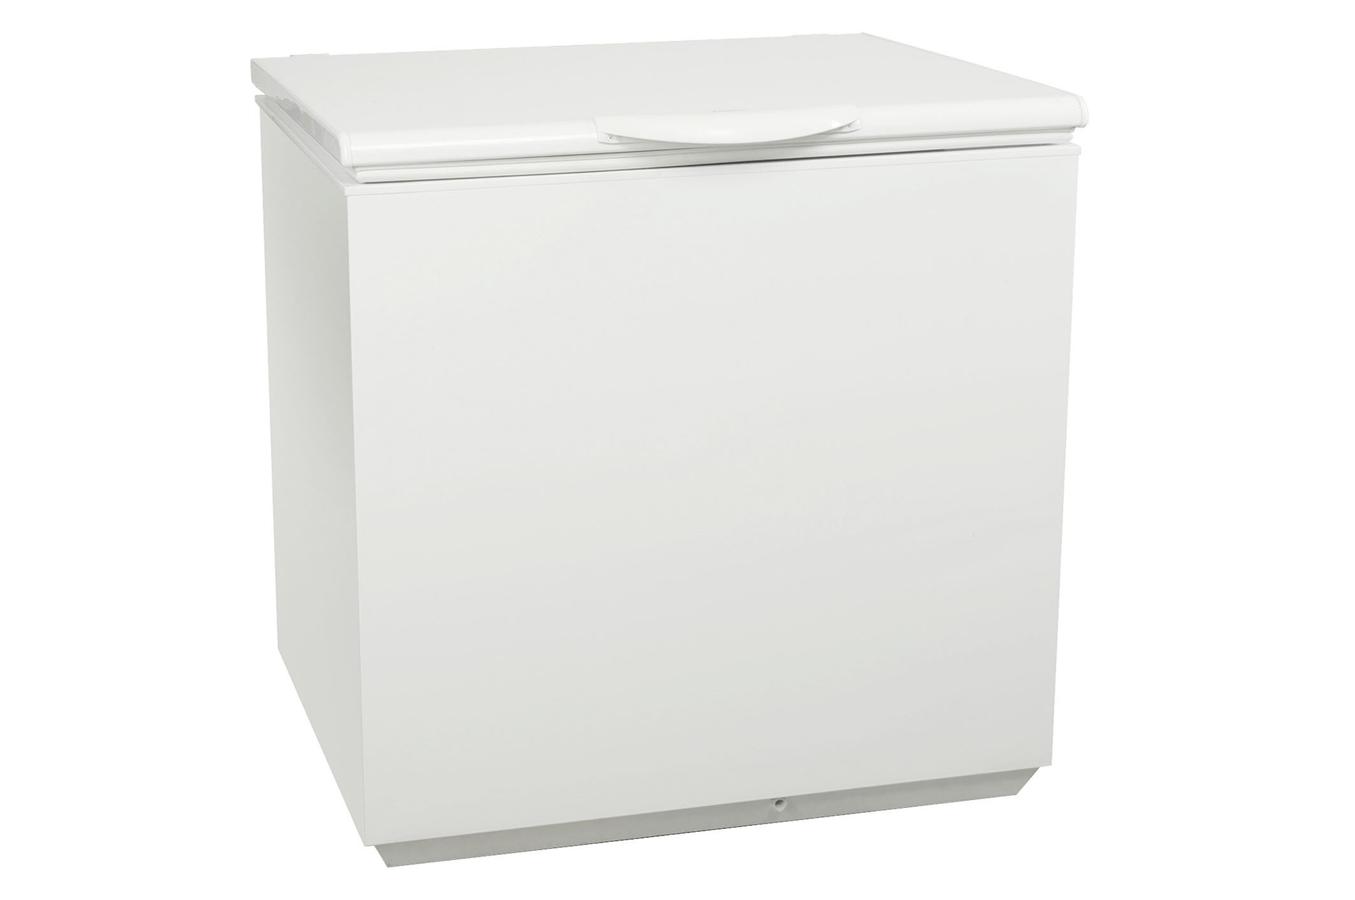 cong lateur coffre proline ccp 210b blanc 2764113 darty. Black Bedroom Furniture Sets. Home Design Ideas